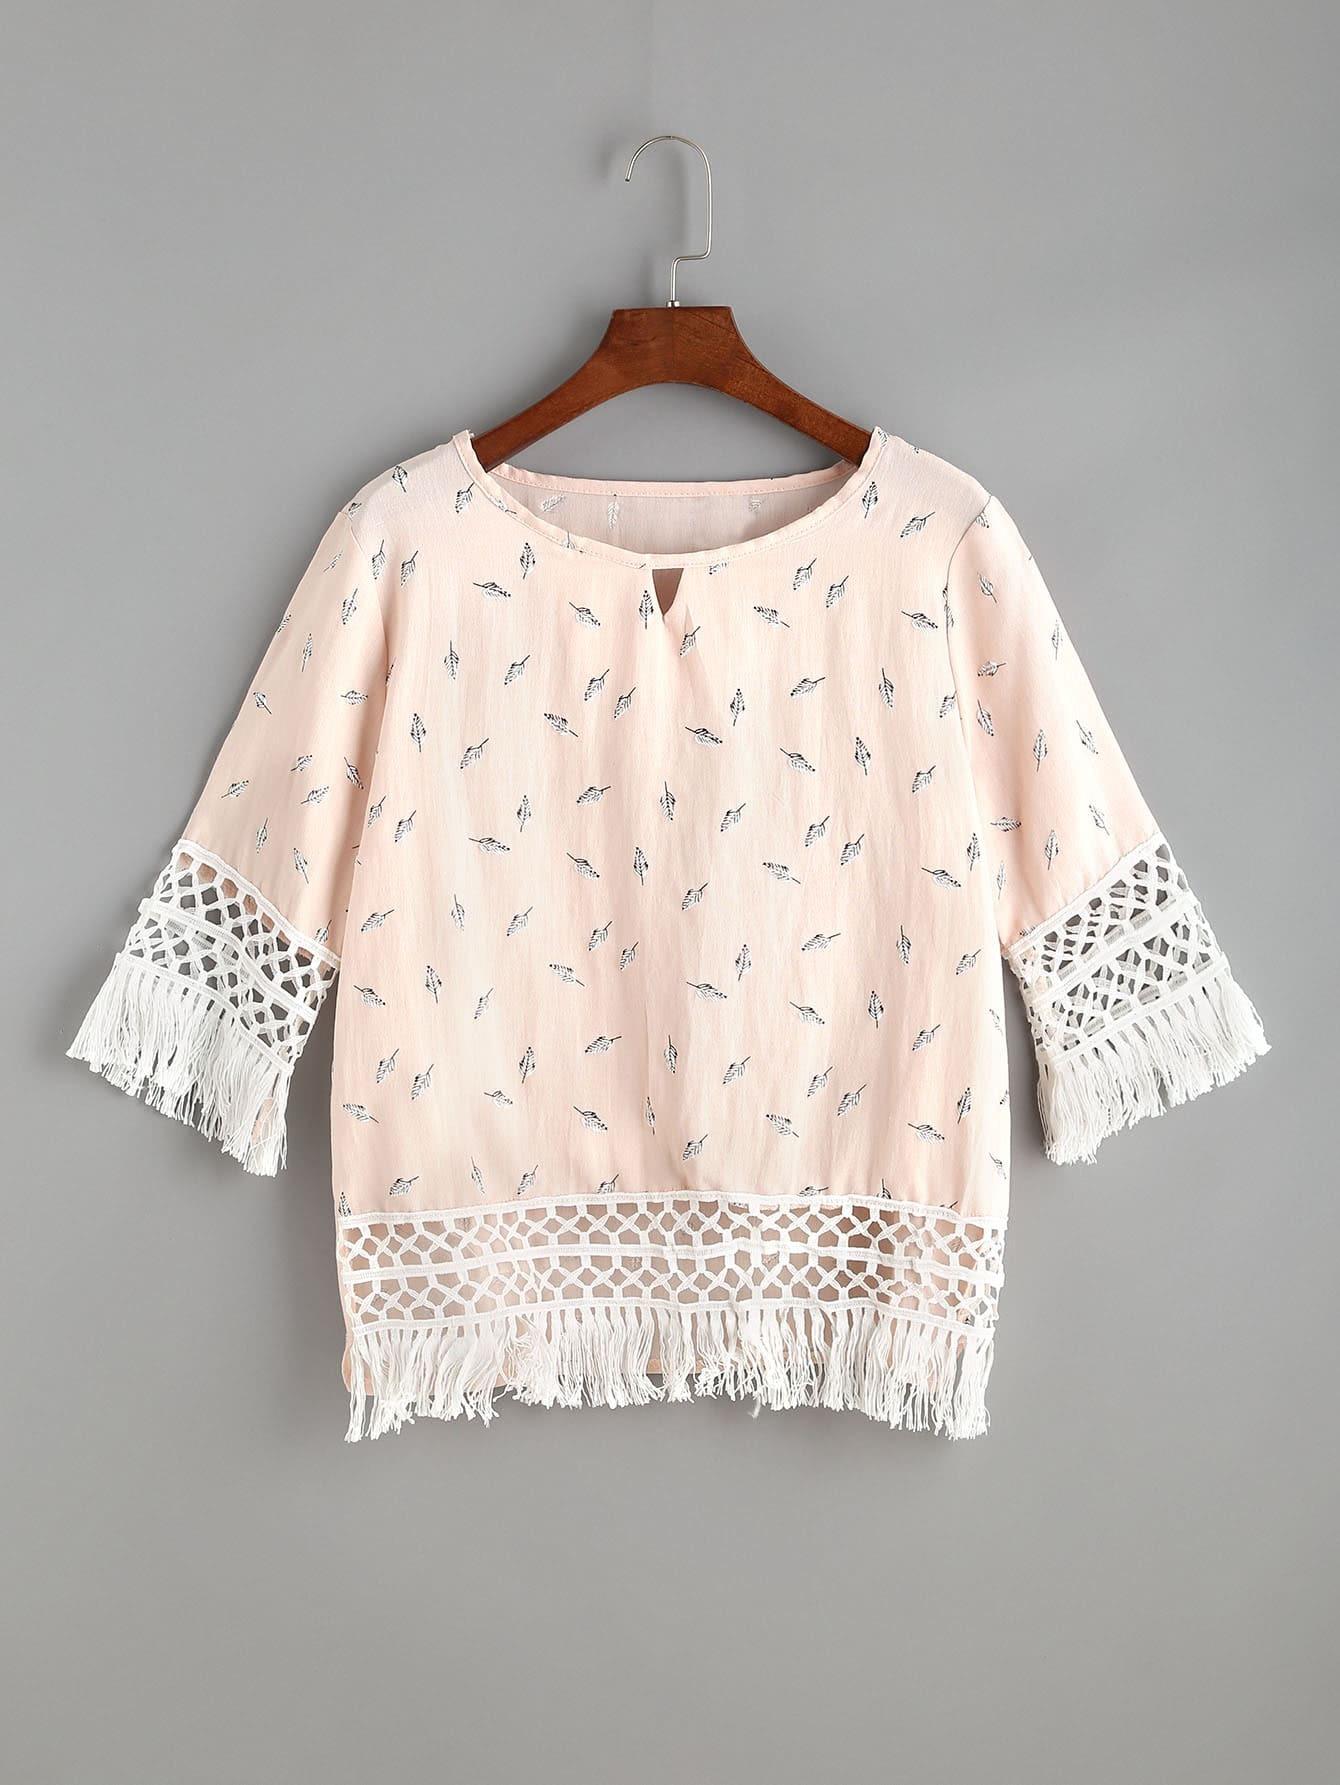 blouse170330004_2